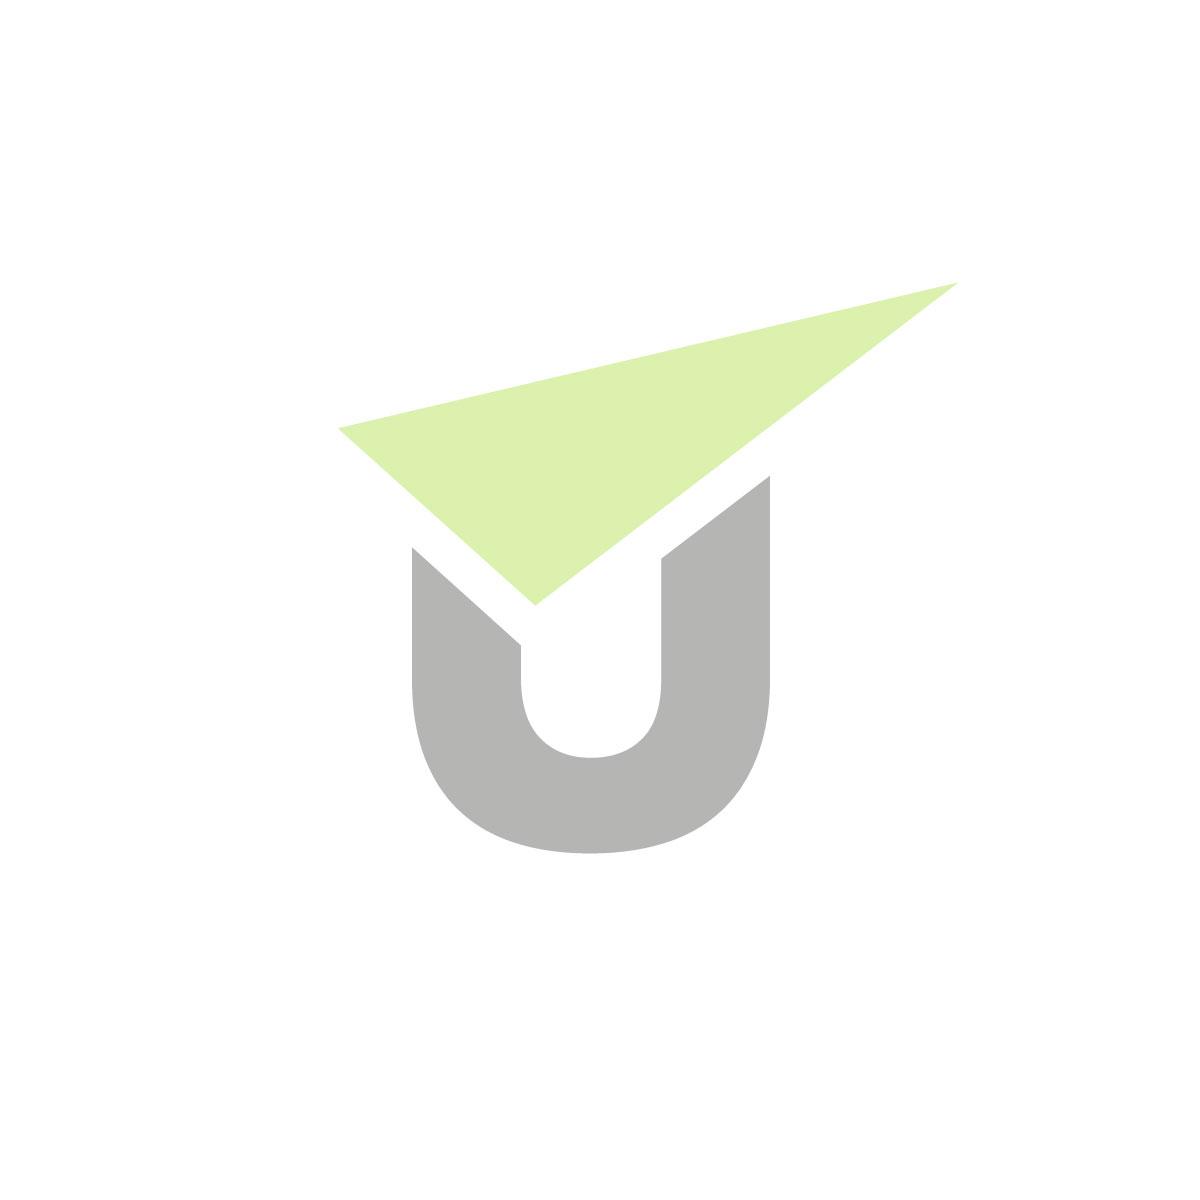 PHOTOLOOM MINT cámara de fotos de madera como producto recomendado